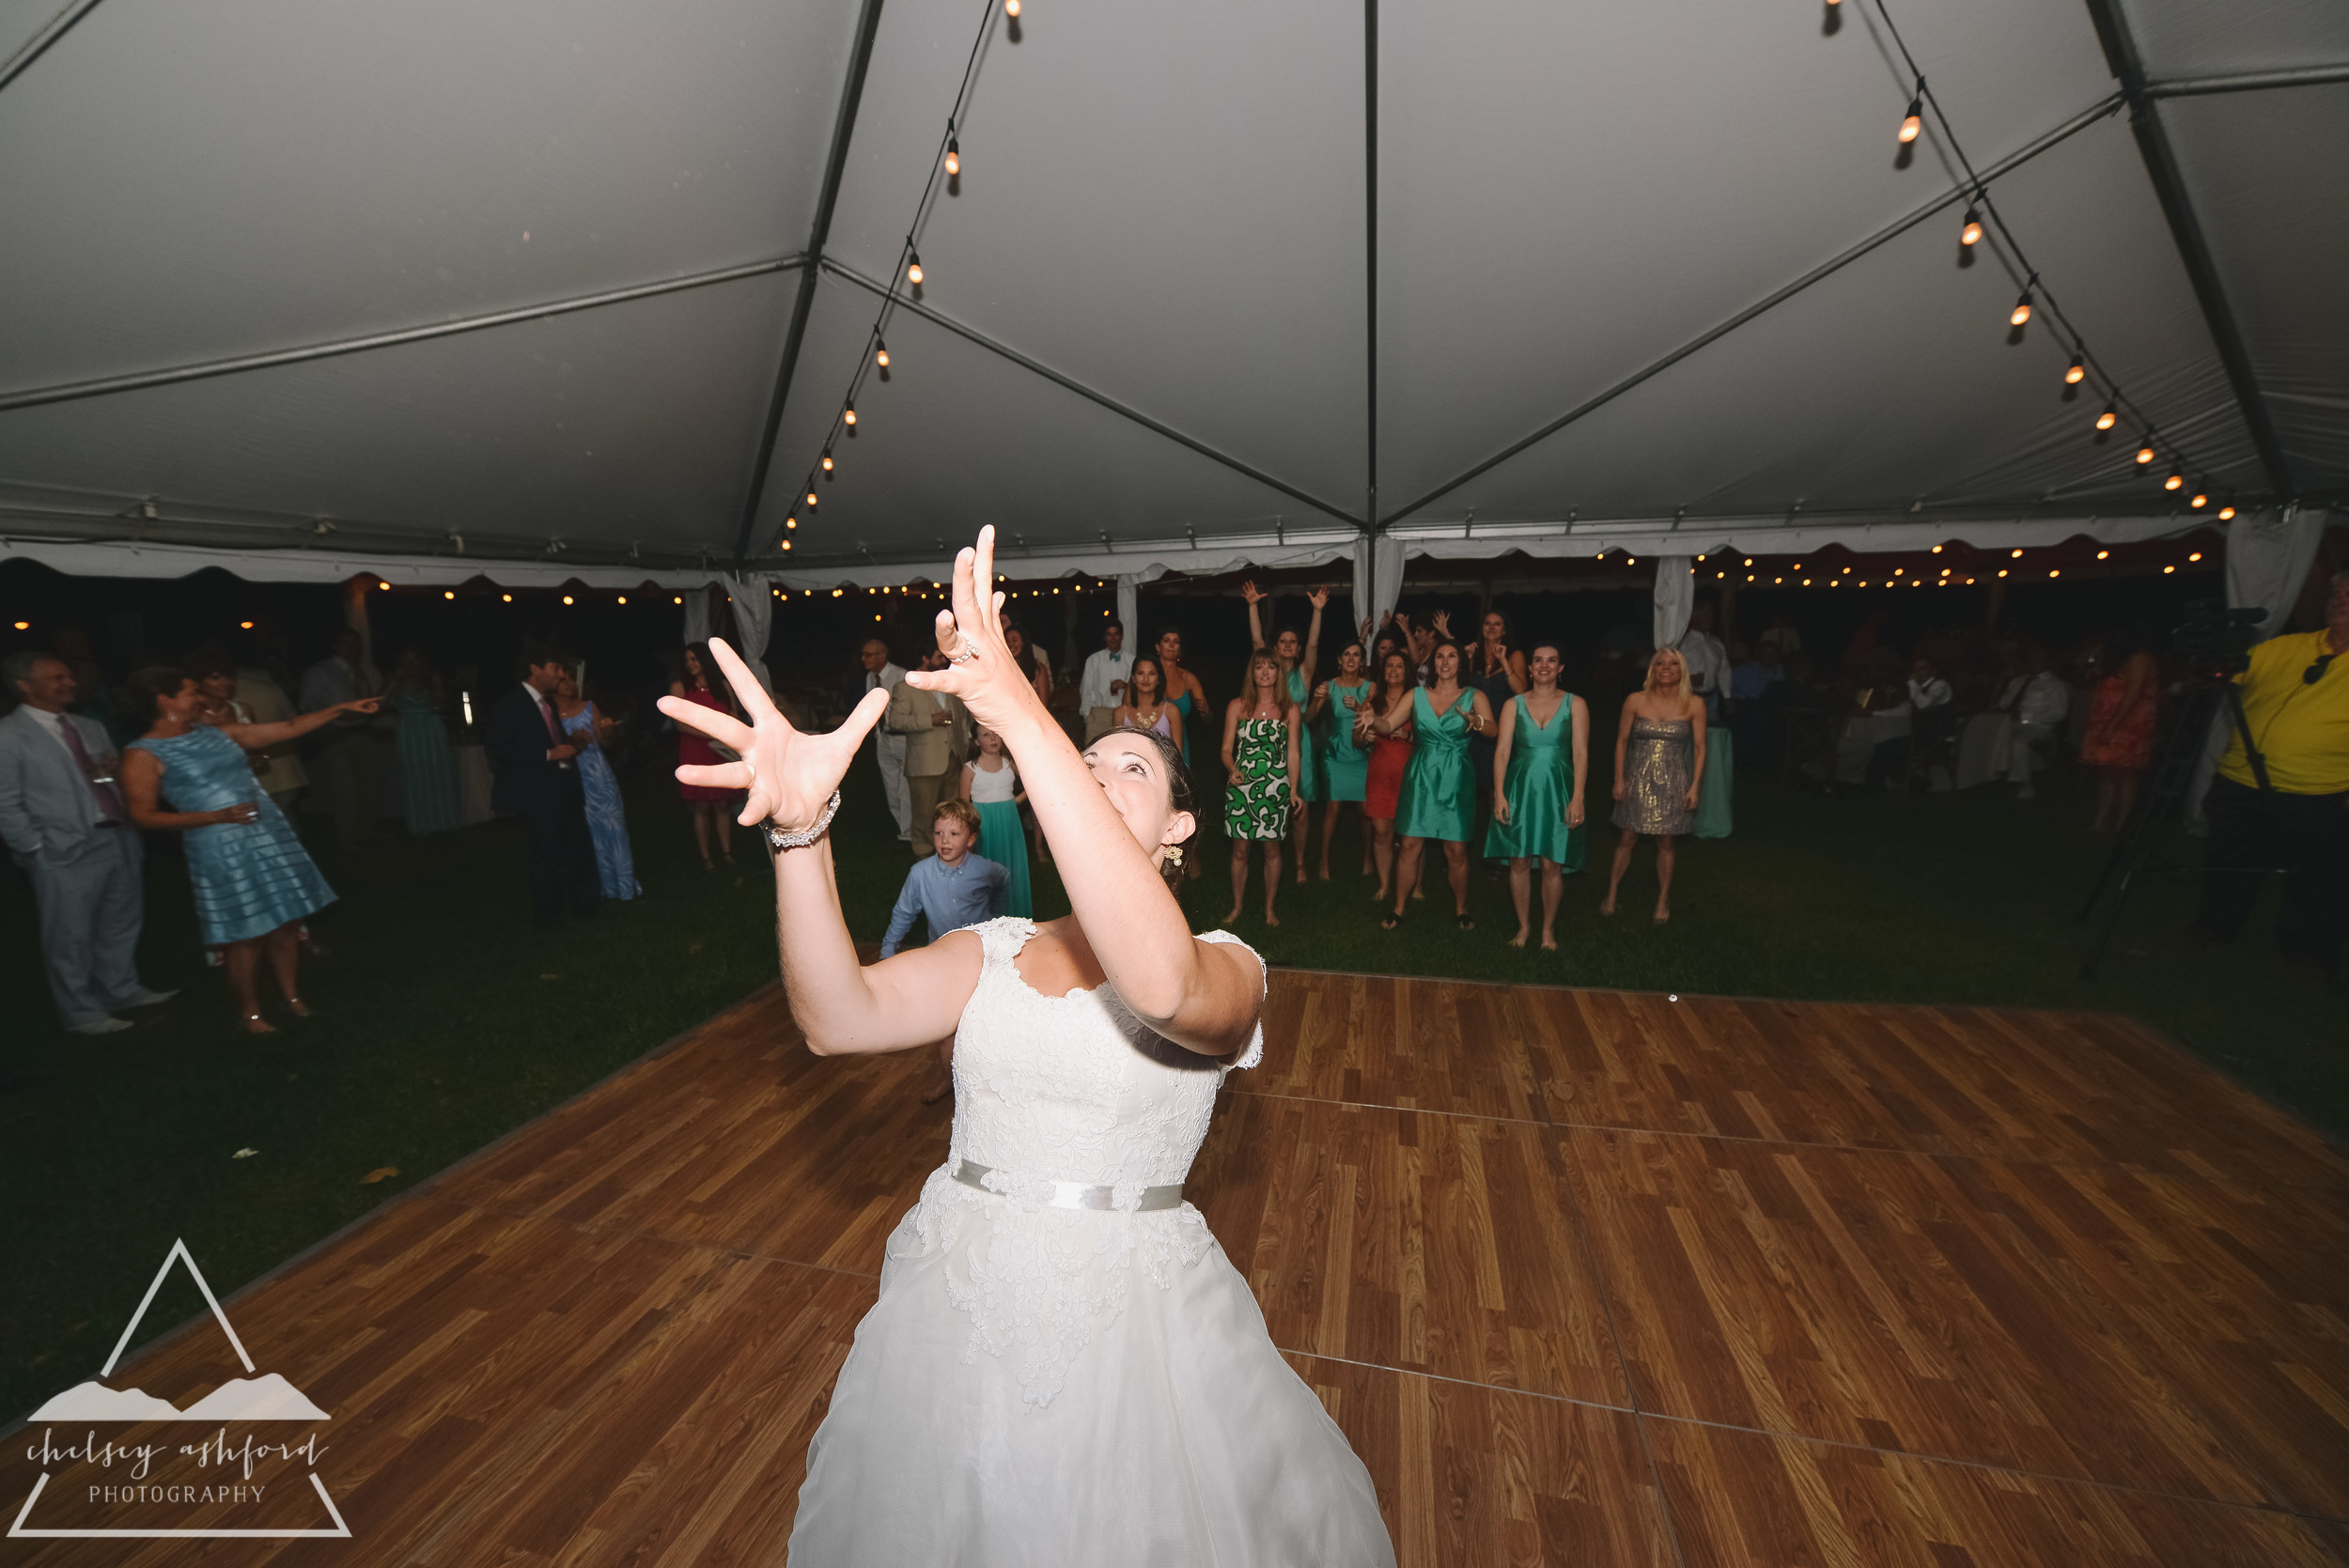 Clarkson_wedding_web-184.jpg